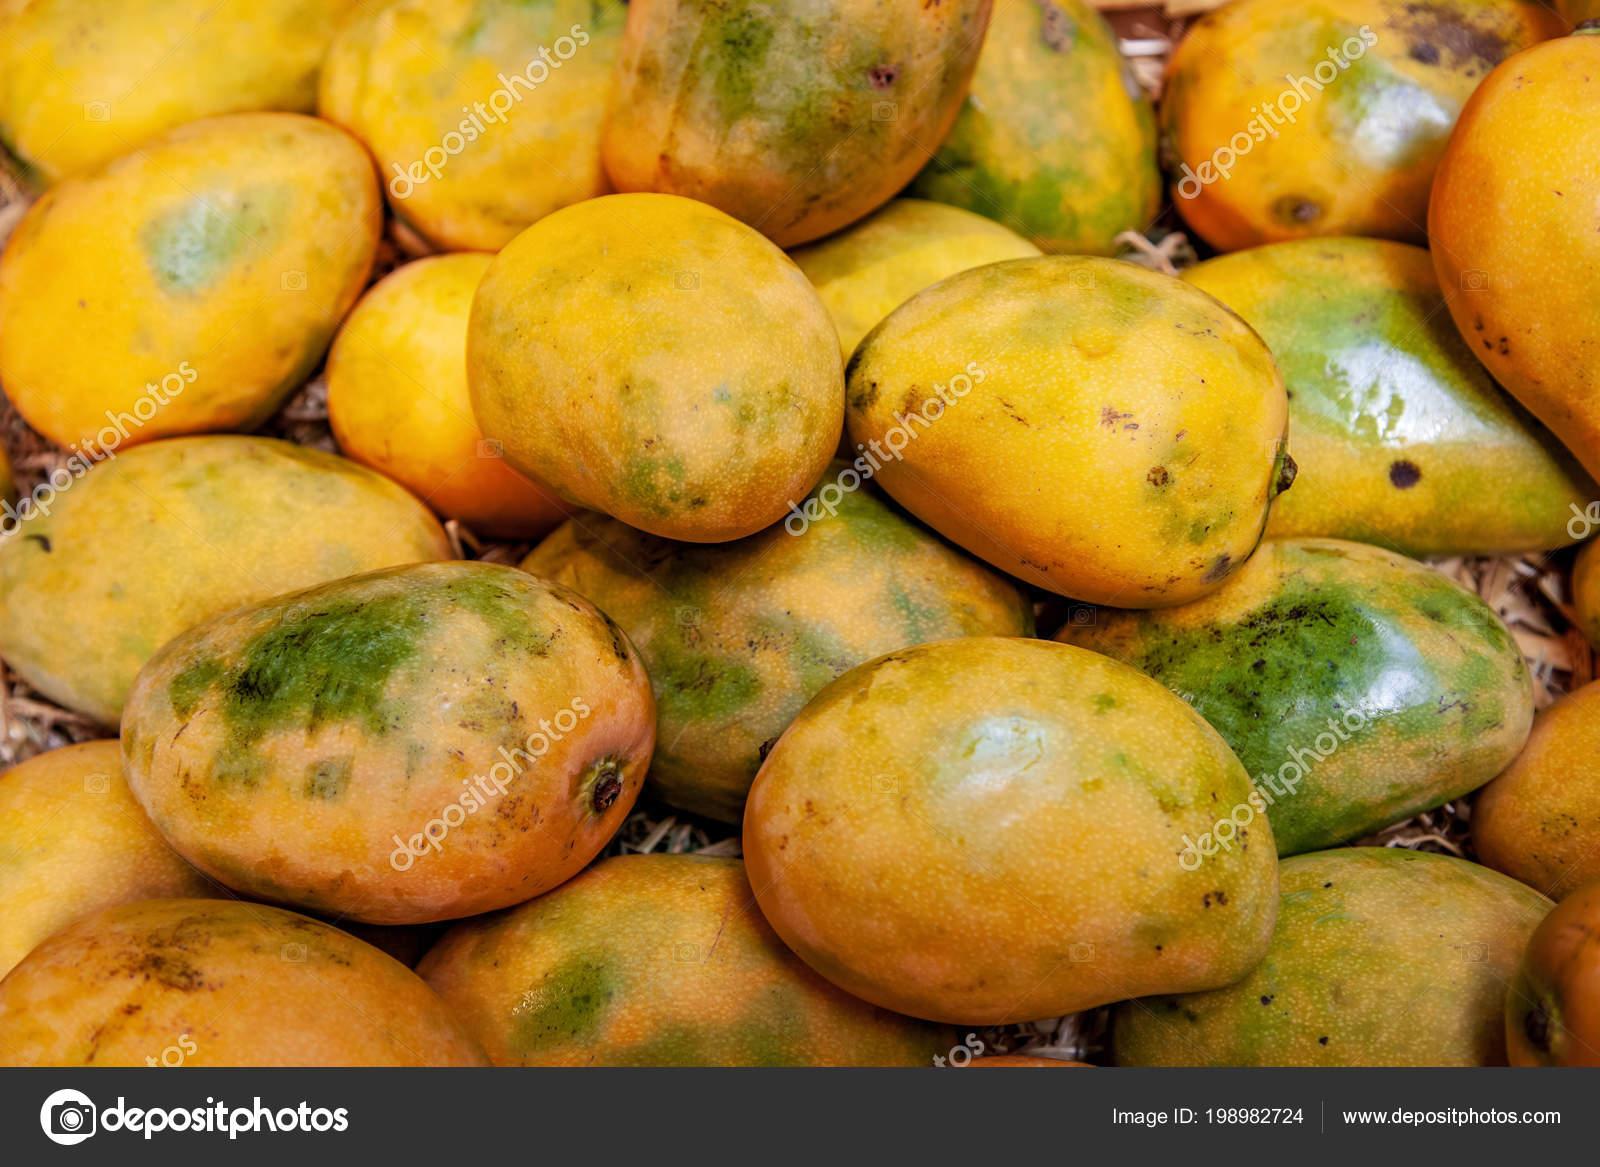 Imagen Fotograma Completo Pila Mangos Amarillos — Foto de stock ...